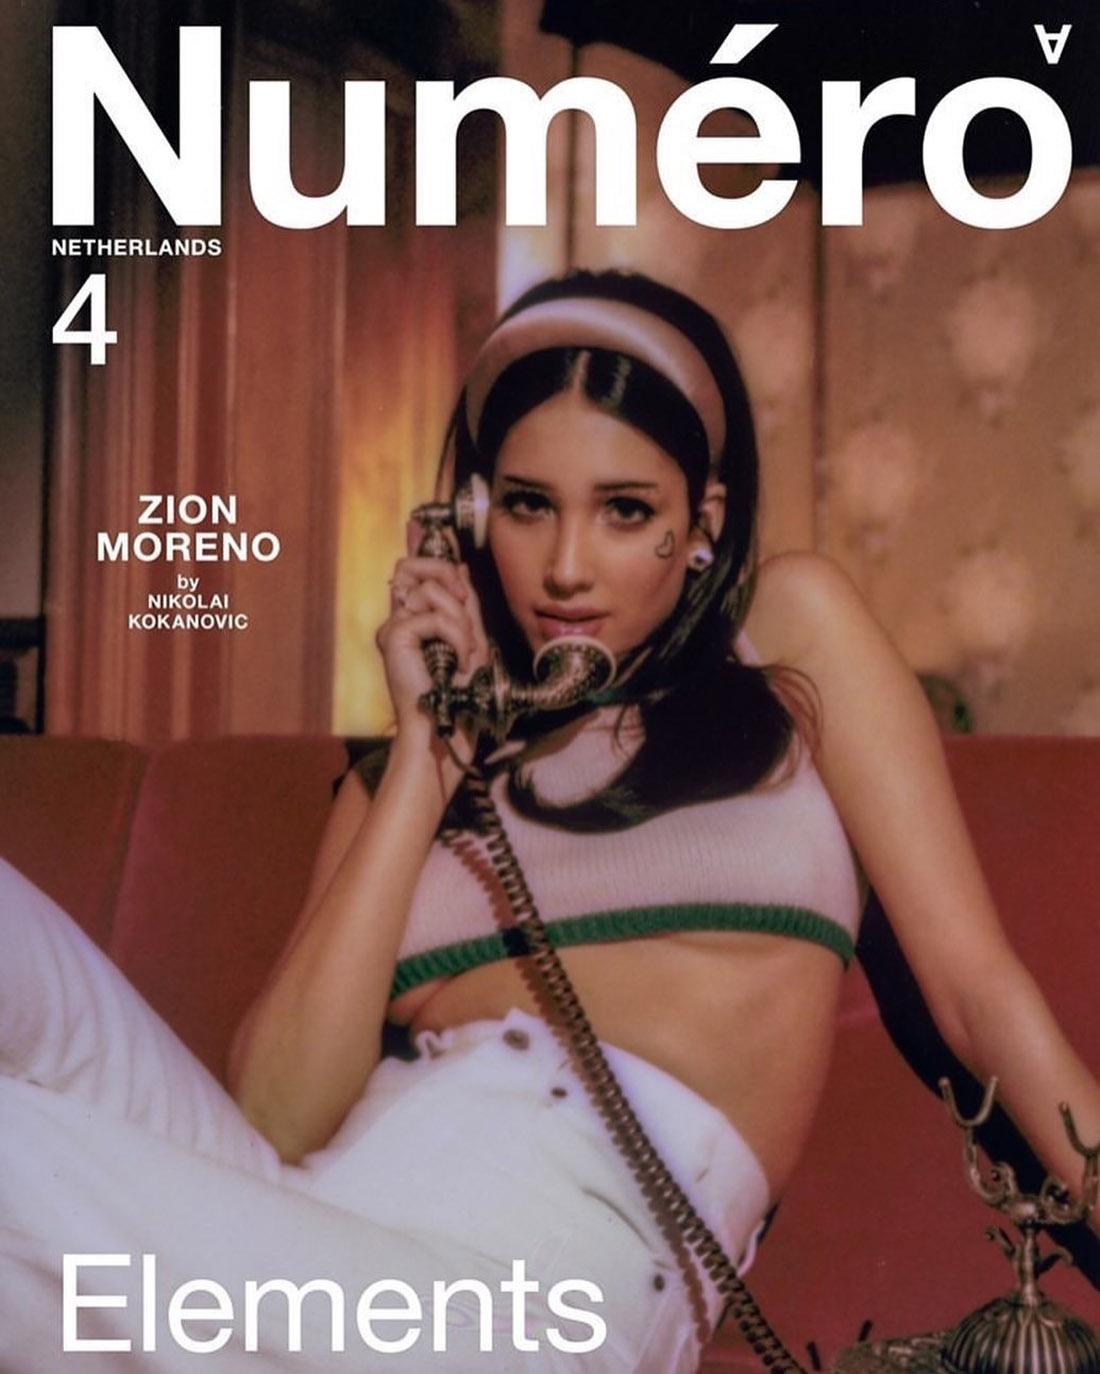 Zion Moreno covers Numéro Netherlands Spring Summer 2021 by Nikolai Kokanovic